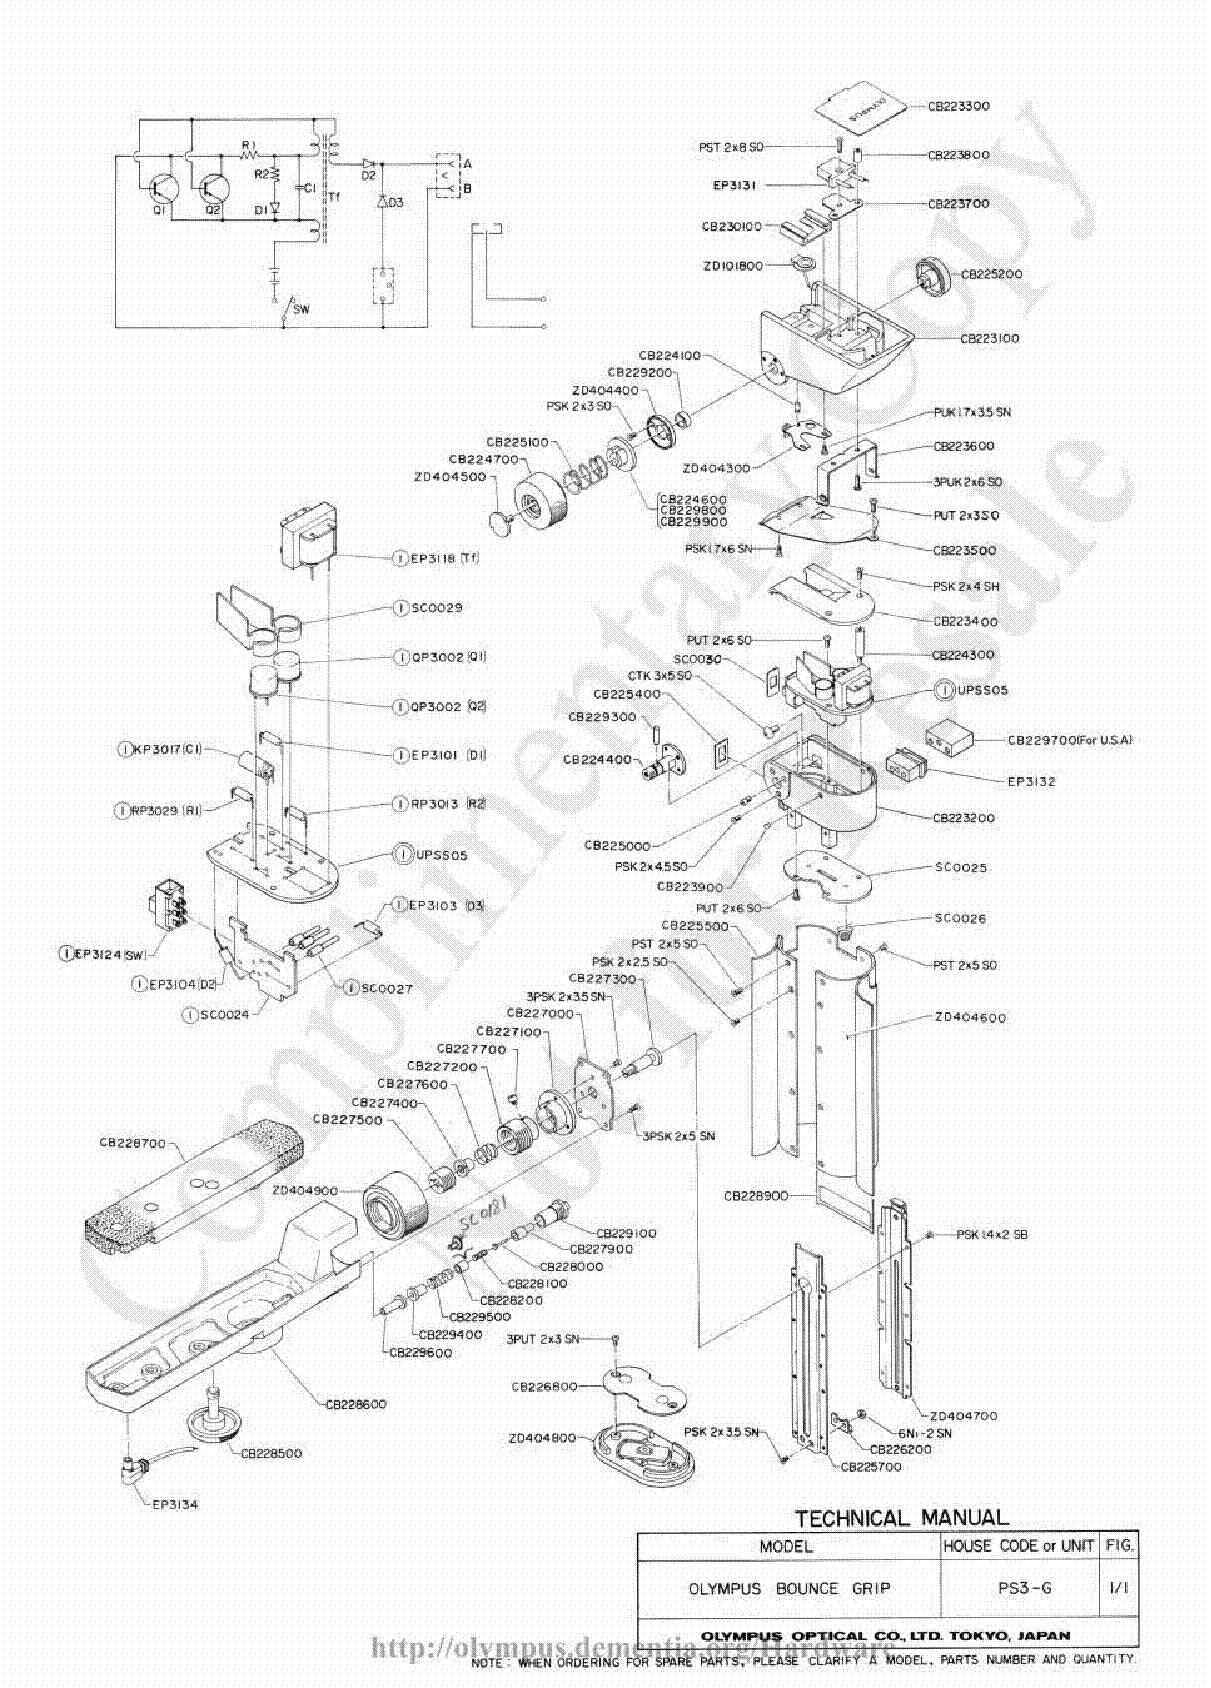 Olympus C 460zoom D 580zoom X 400 Parts List Service